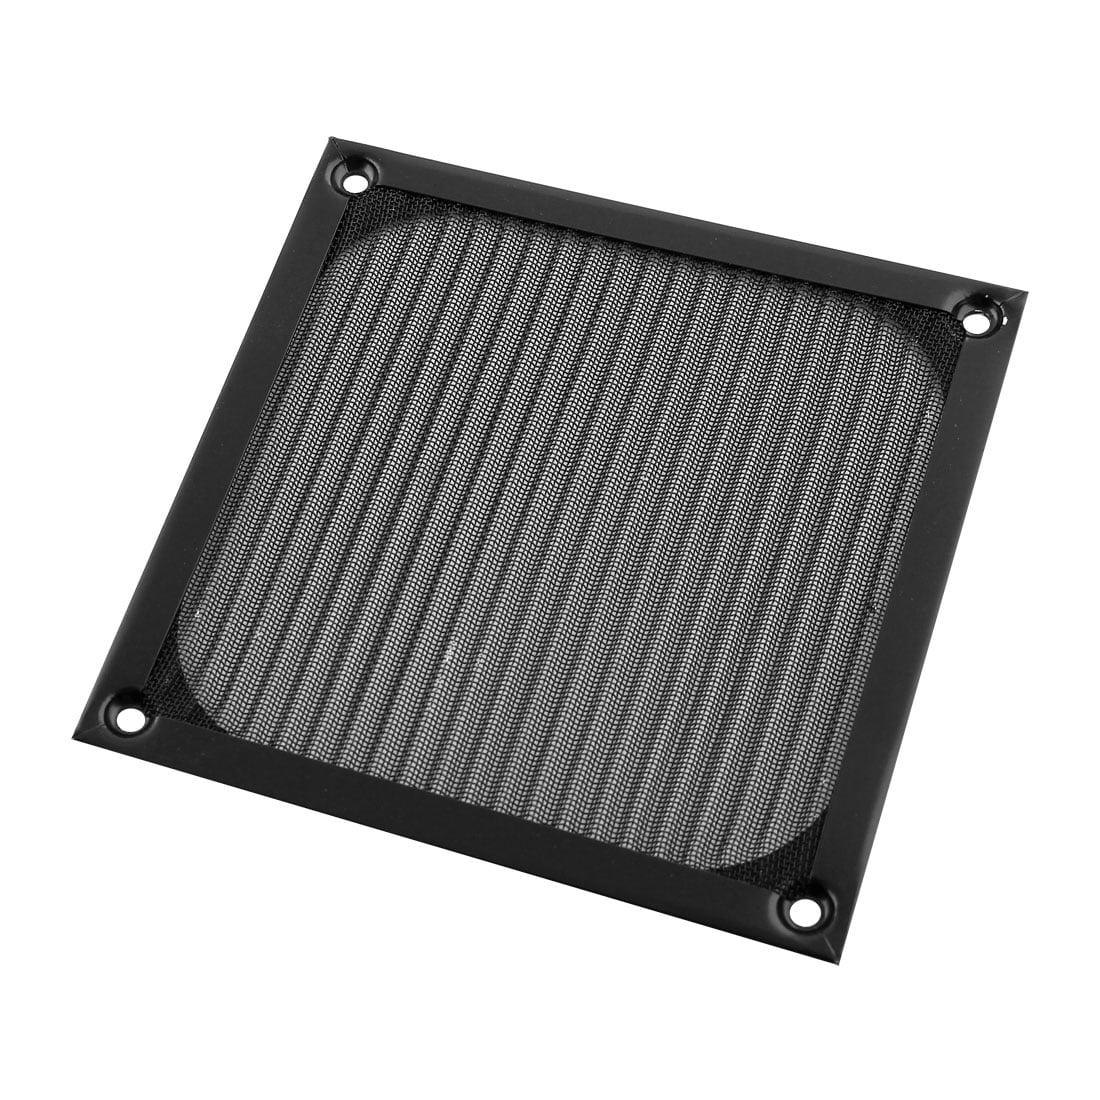 Square Black Aluminum Dustproof Mesh Filter for 120mm PC Cooler Fan